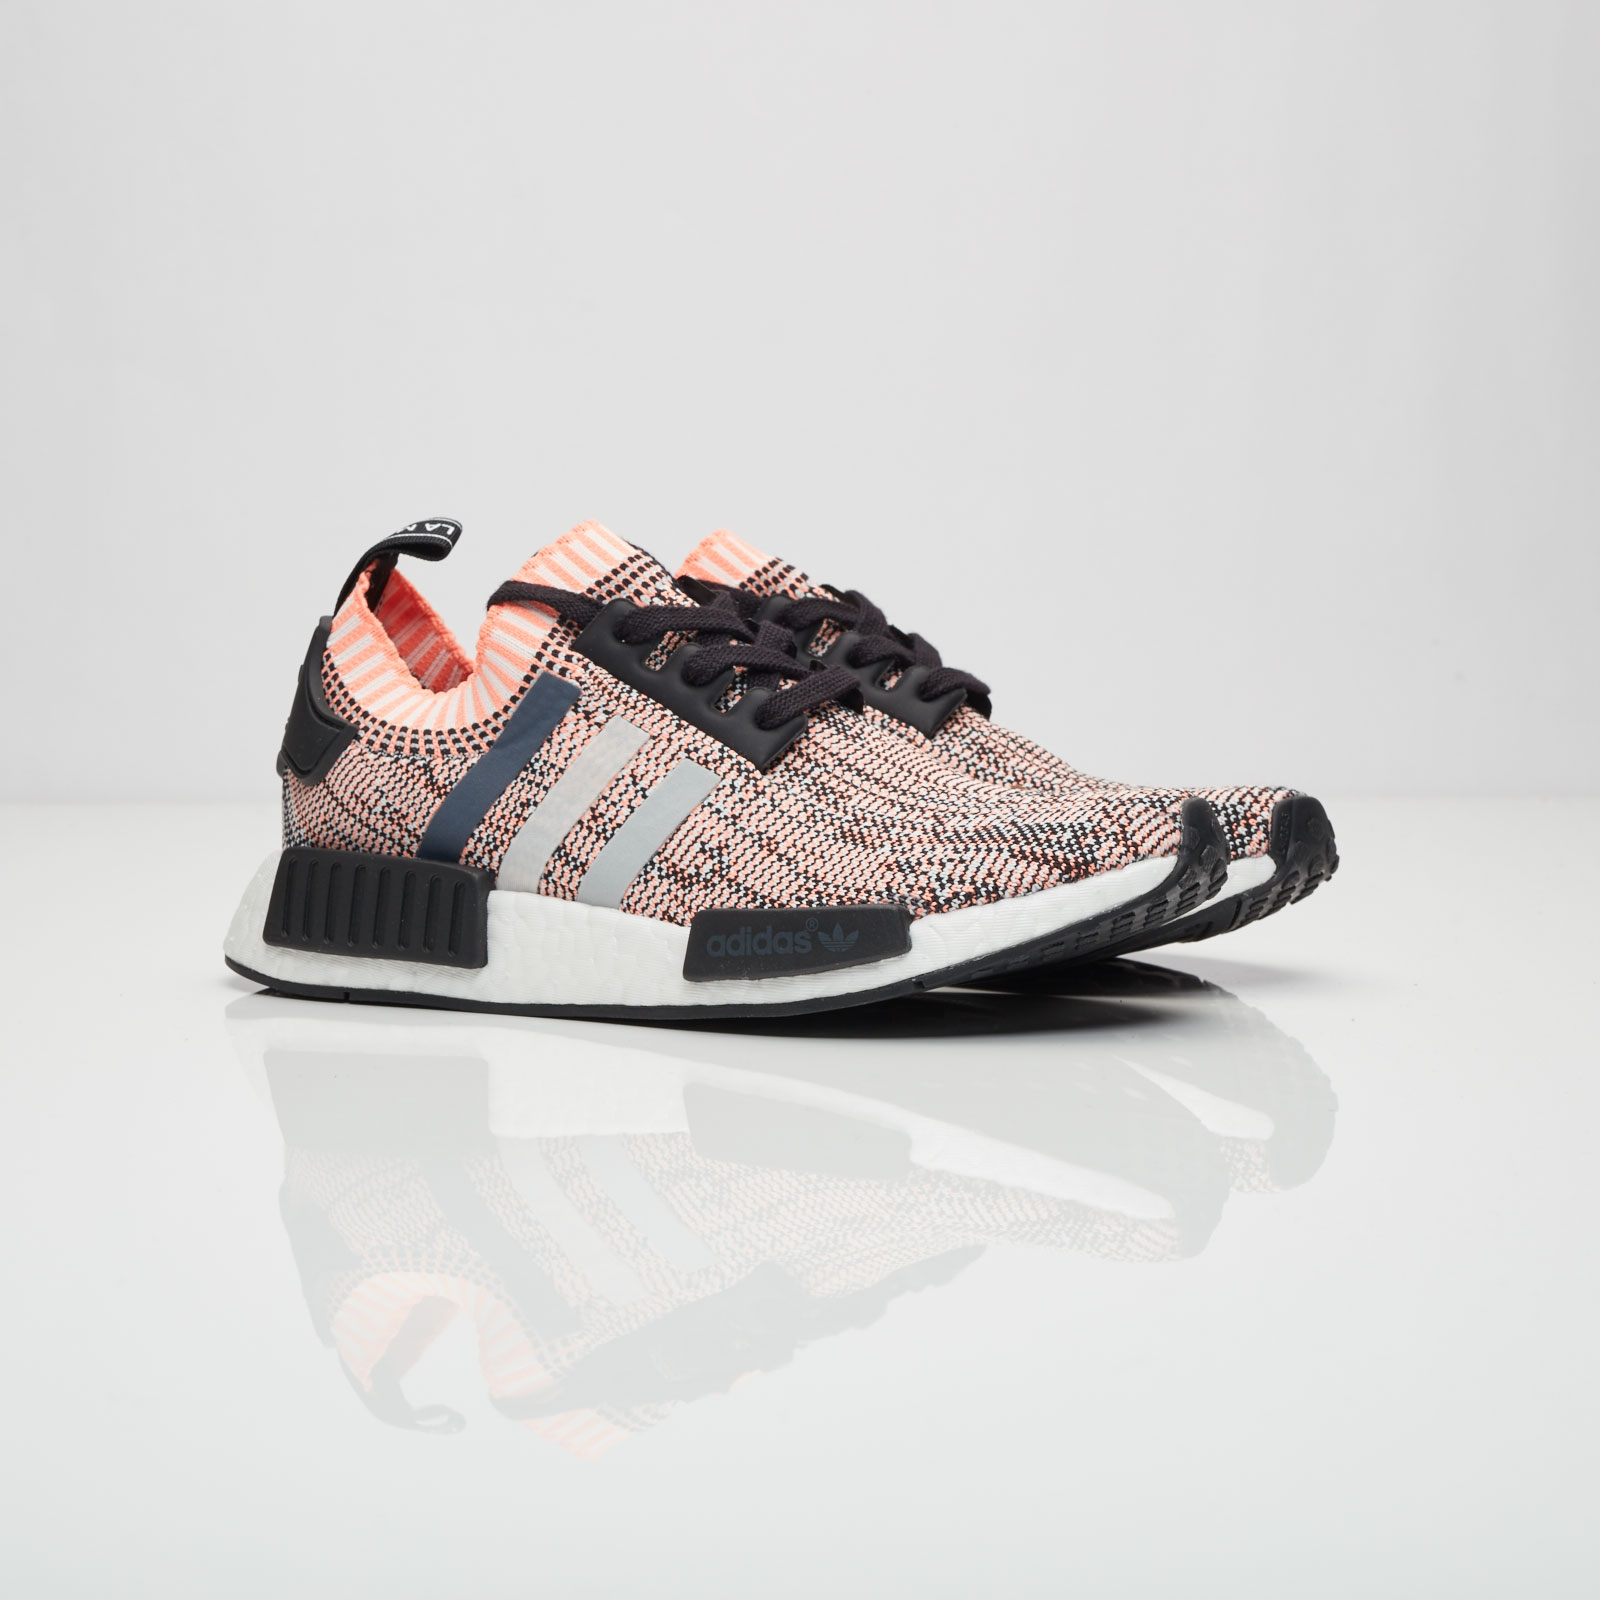 496a57fb29a4b1 adidas NMD R1 W PK - Bb2361 - Sneakersnstuff